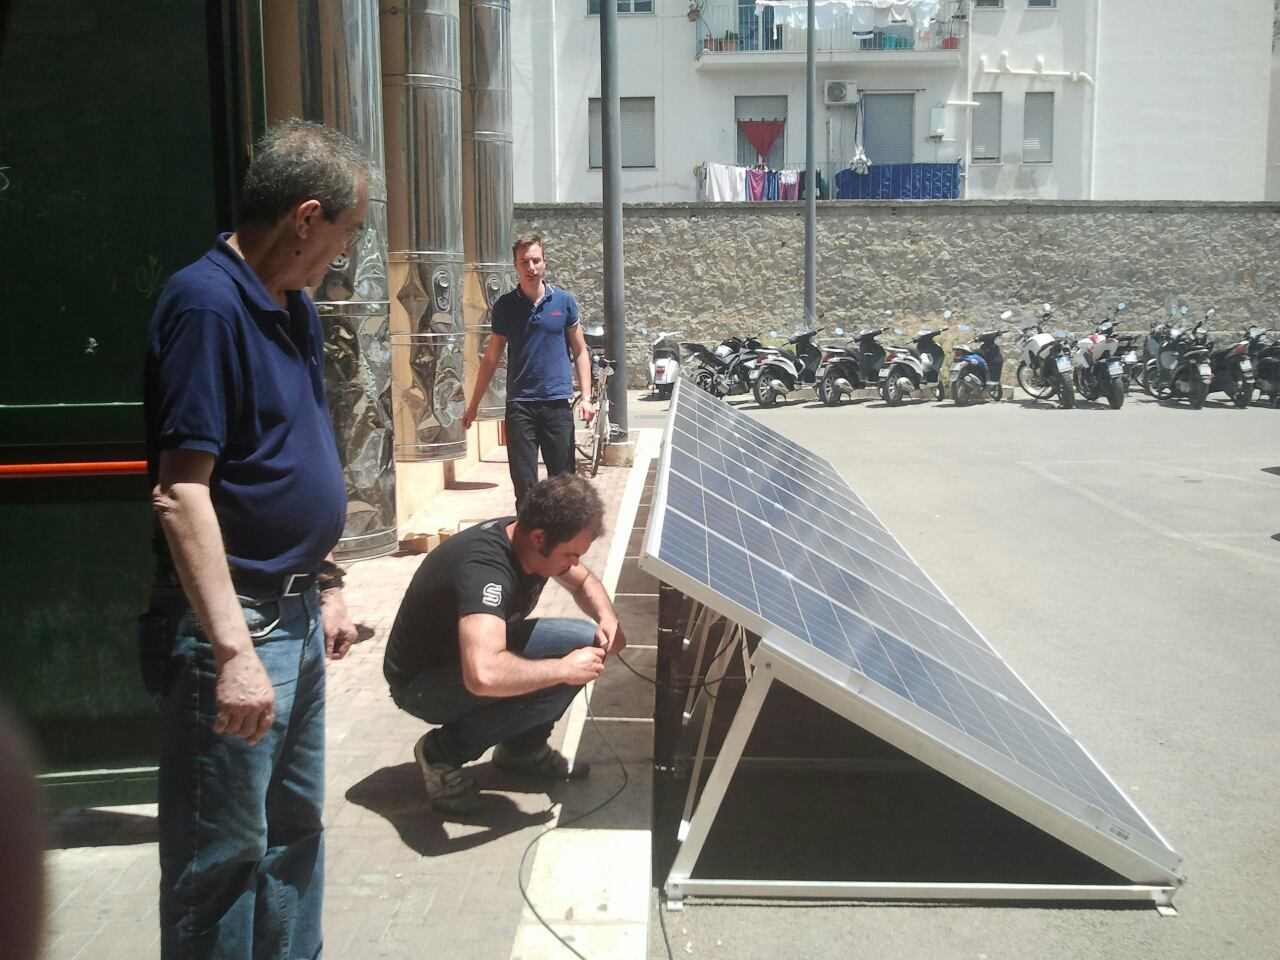 tecnico-energie-rinnovabili-1